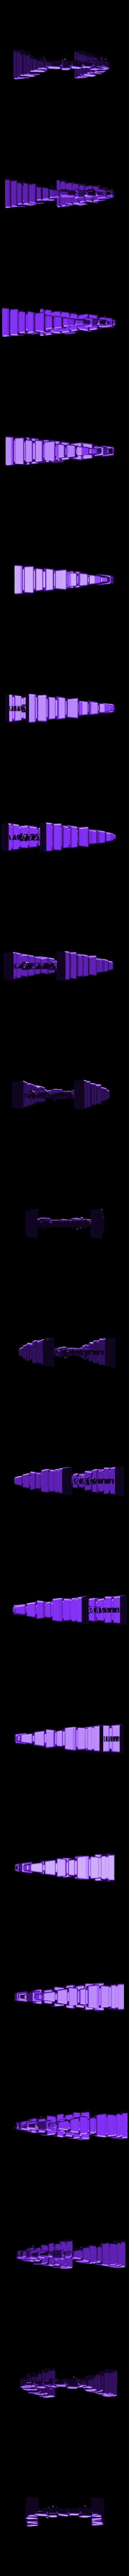 Stone_Door_with_Wood_Grain.stl Download free STL file Stone Dungeon Door - Working with Wood Grain (Remix) • 3D printer template, RobagoN